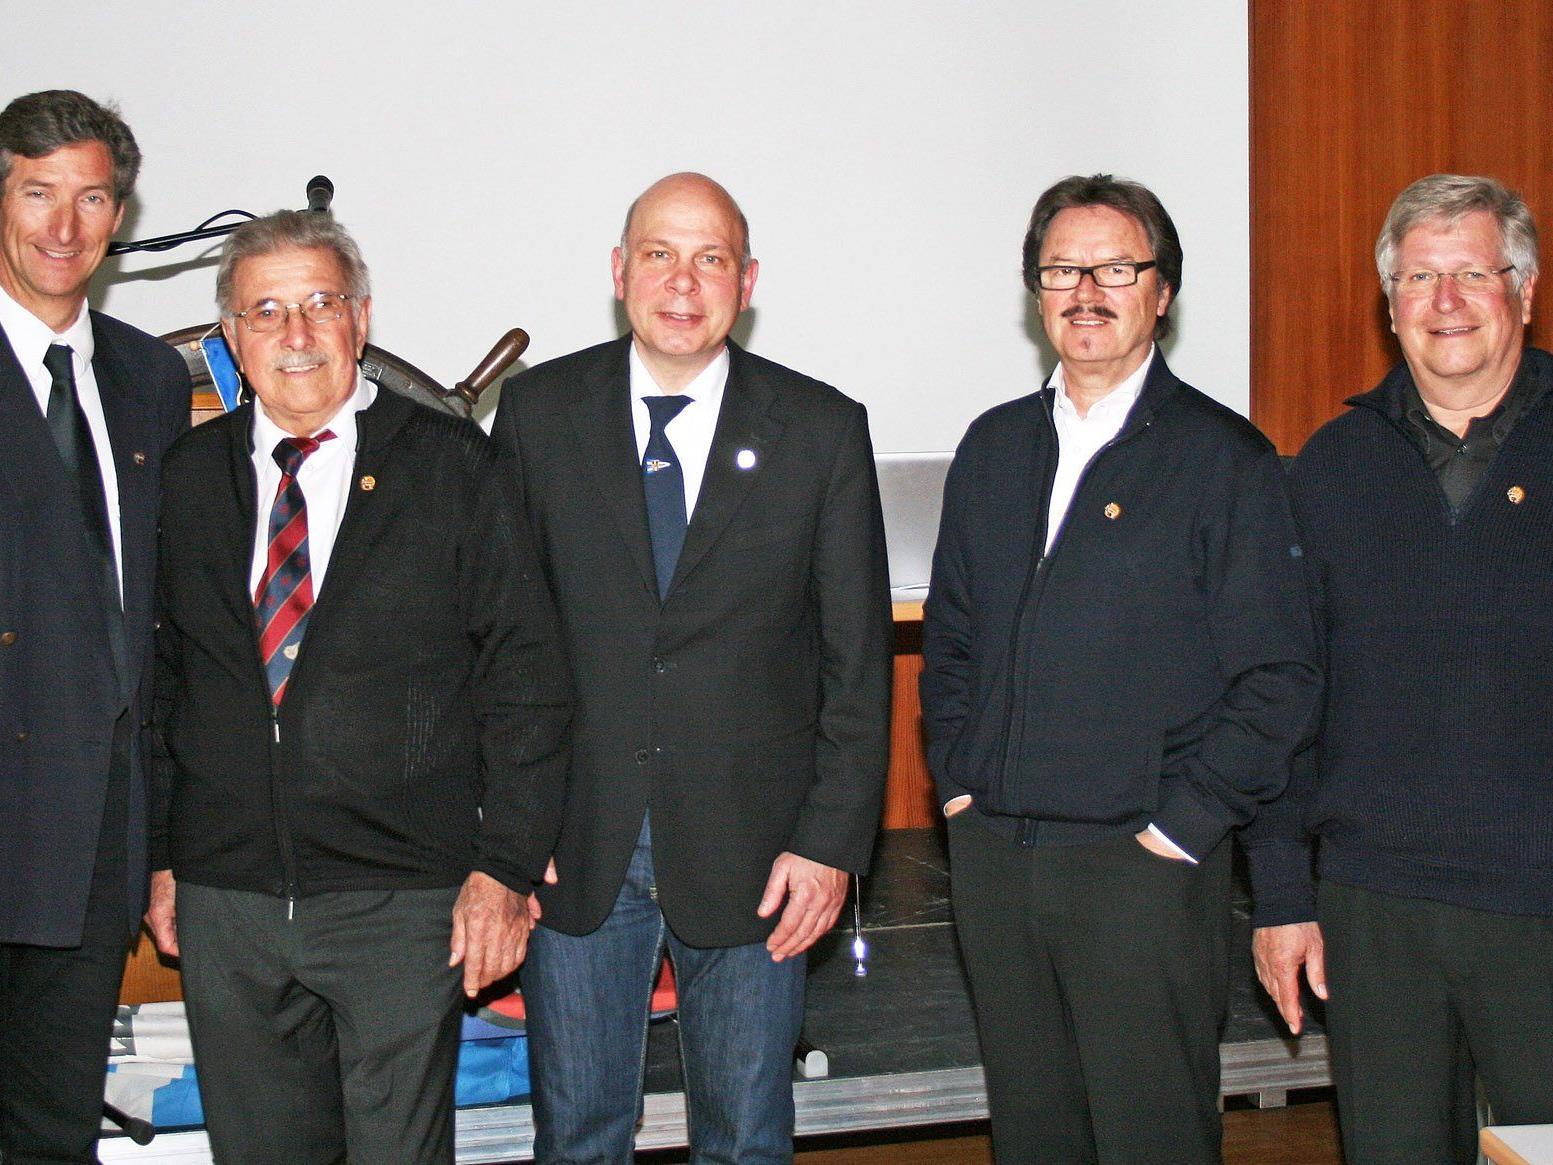 Präsident Martin Schweninger mit Emil Milz, Wolfgang Lampert, Dietmar Amann und Kurt Ludescher